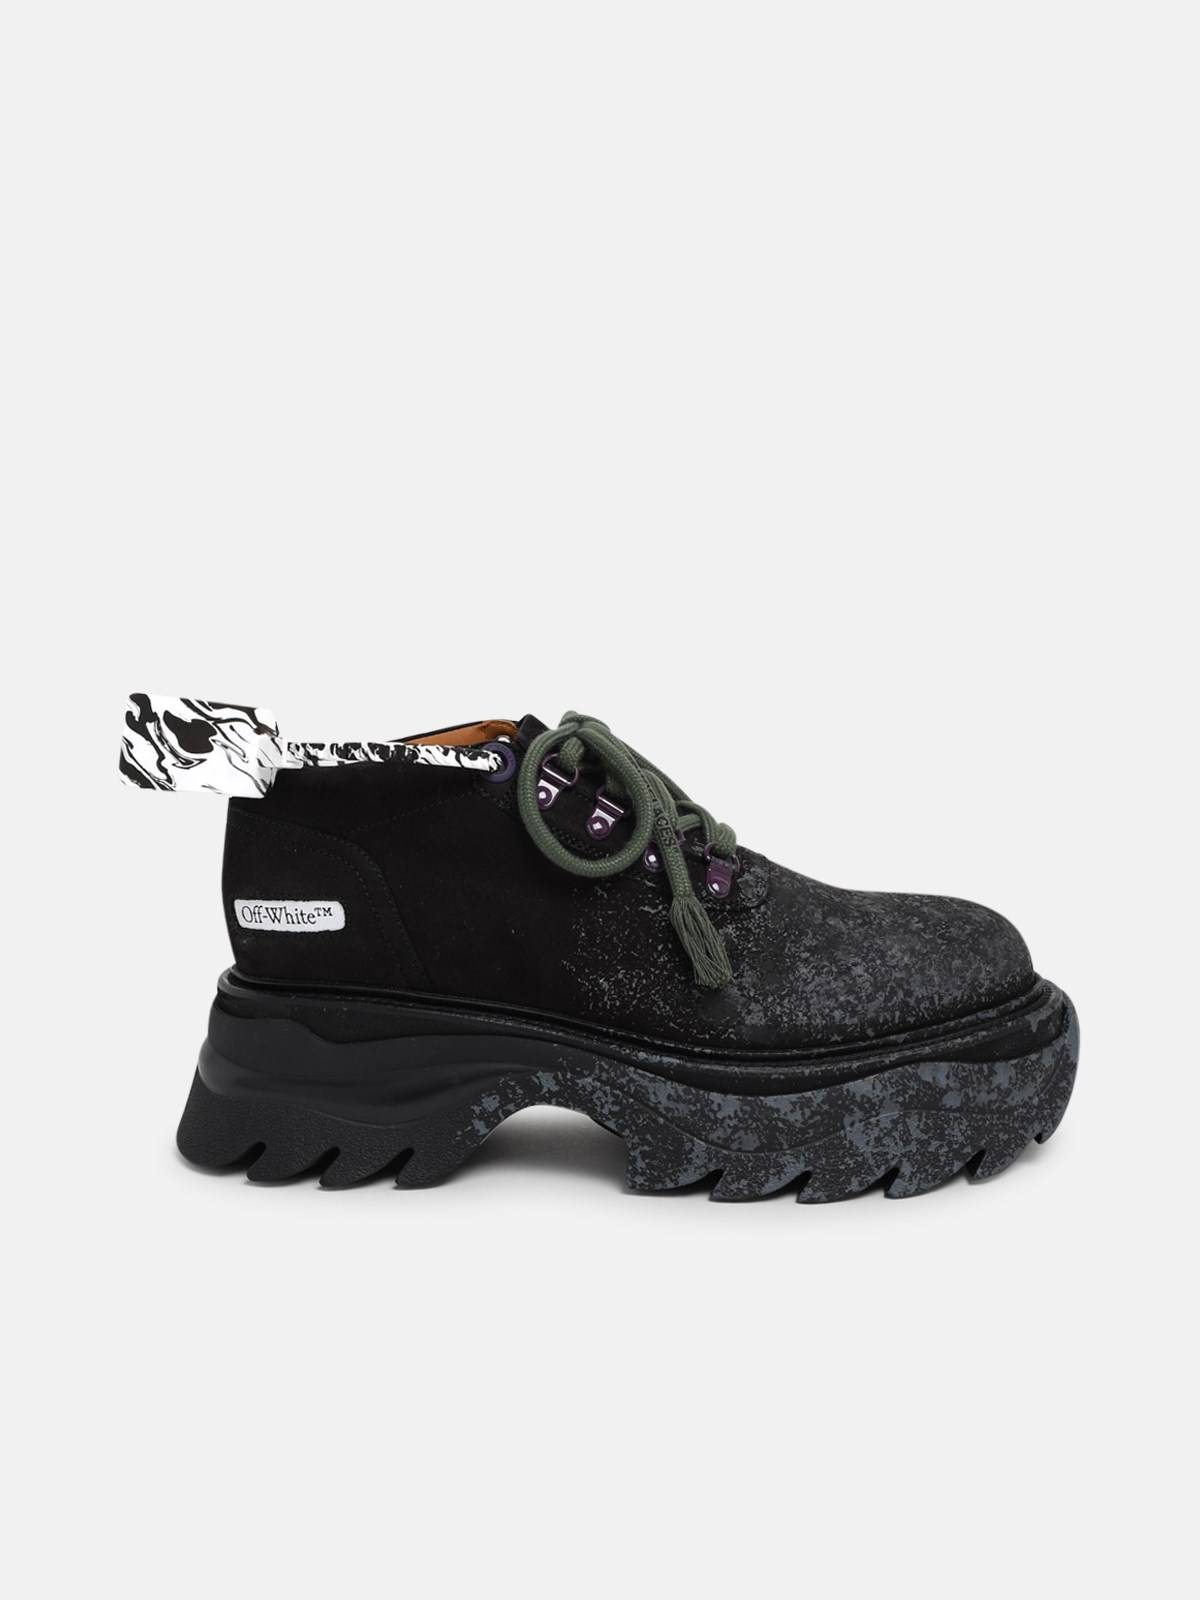 OFF WHITE Black Chunky Shoes (size: EU 40)